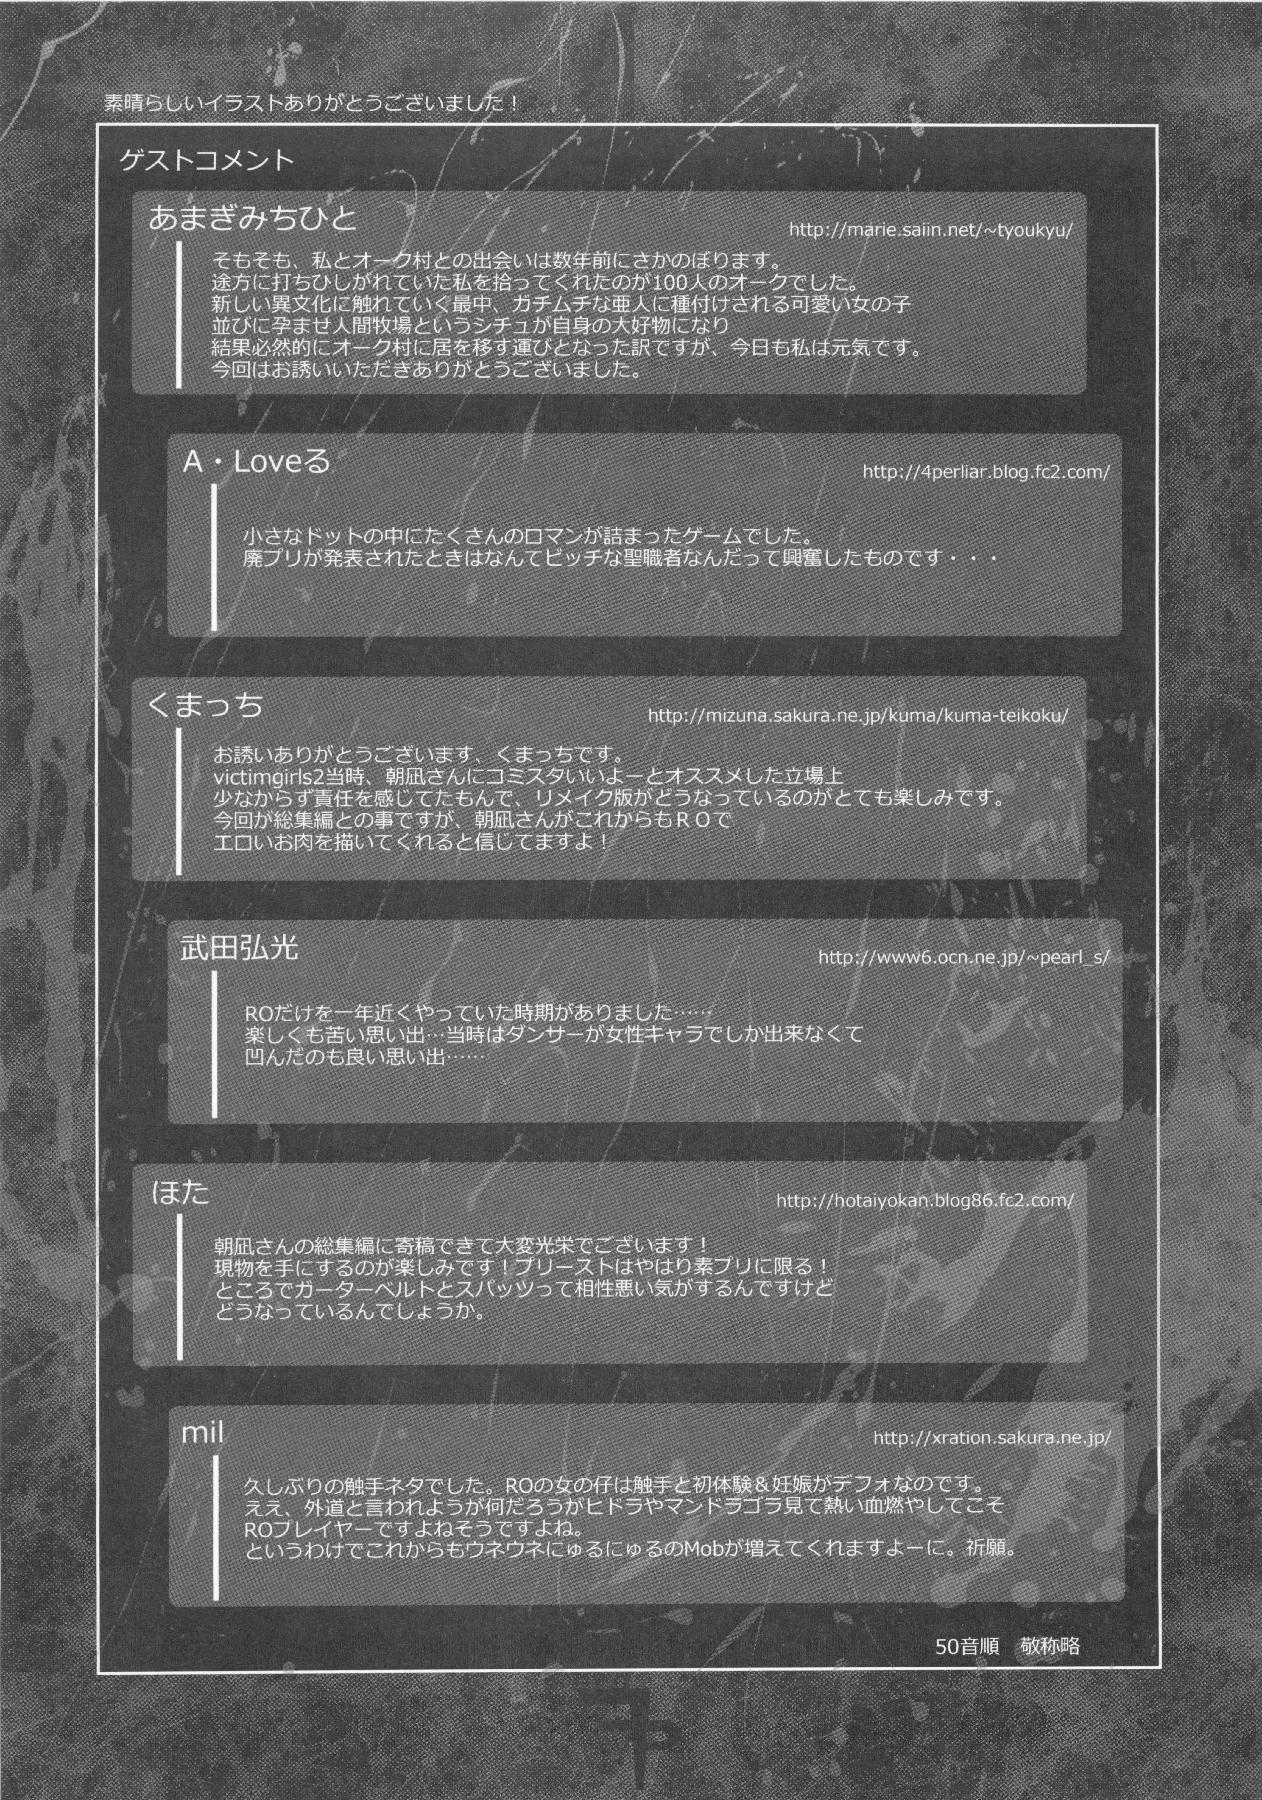 (C83) [Fatalpulse (Asanagi)] VictimGirls Compiled Vol.1 -Victimgirls Soushuuhen 1- MMO Game Selection (Various) 189